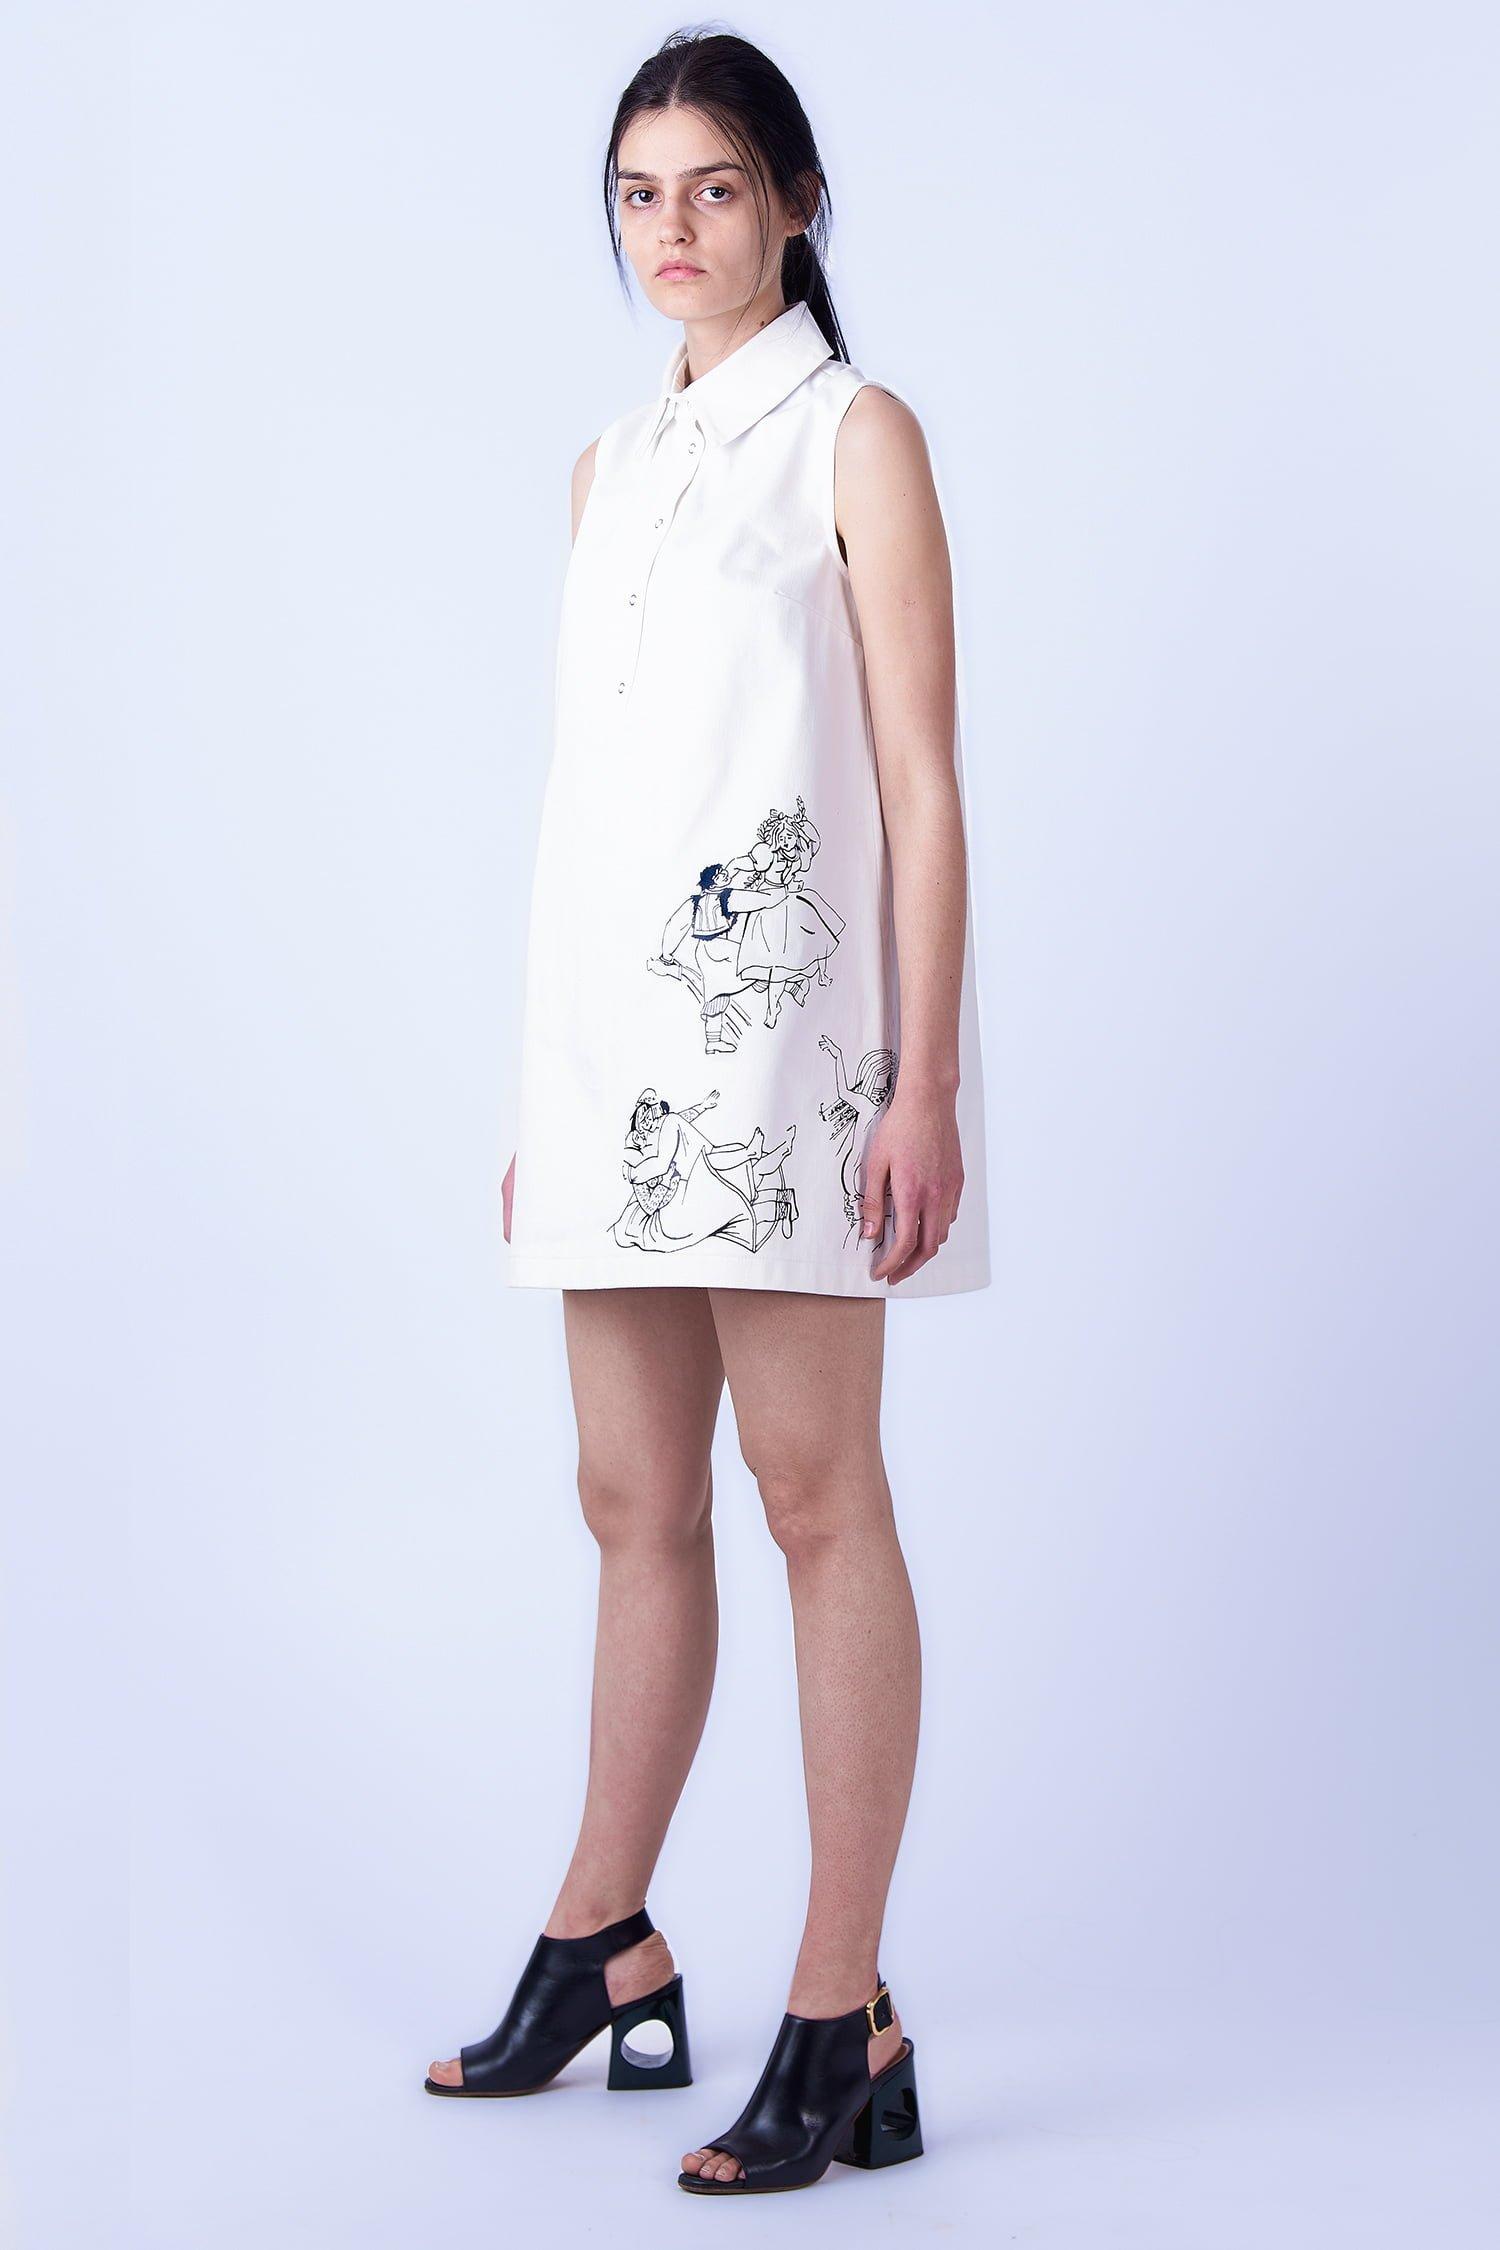 Acephala SS2019 Slavic Goddesses - White Print Mini Dress Sukienka Biała Print side